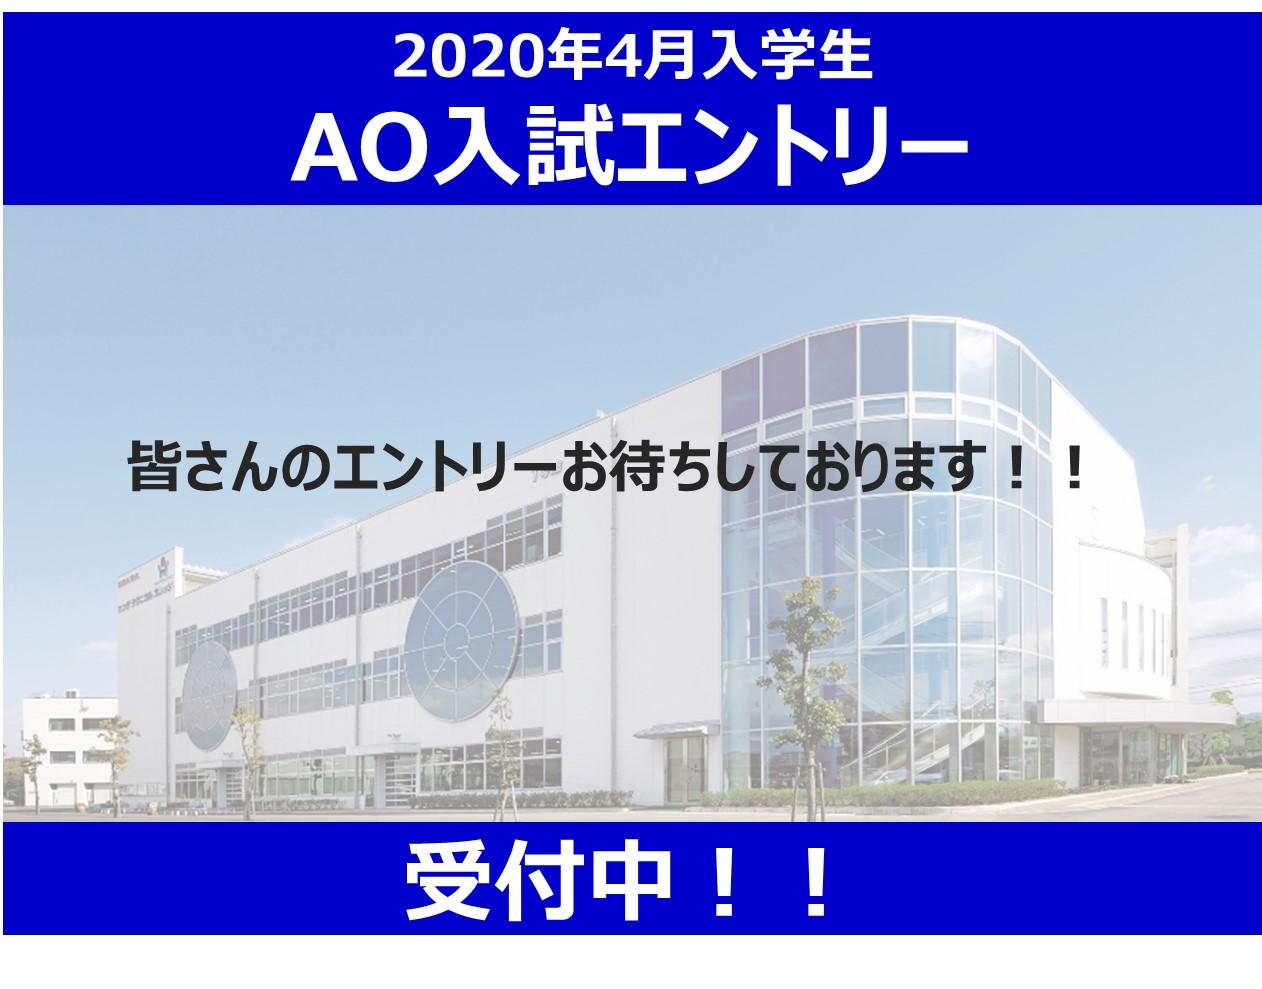 AO入試 エントリー受付